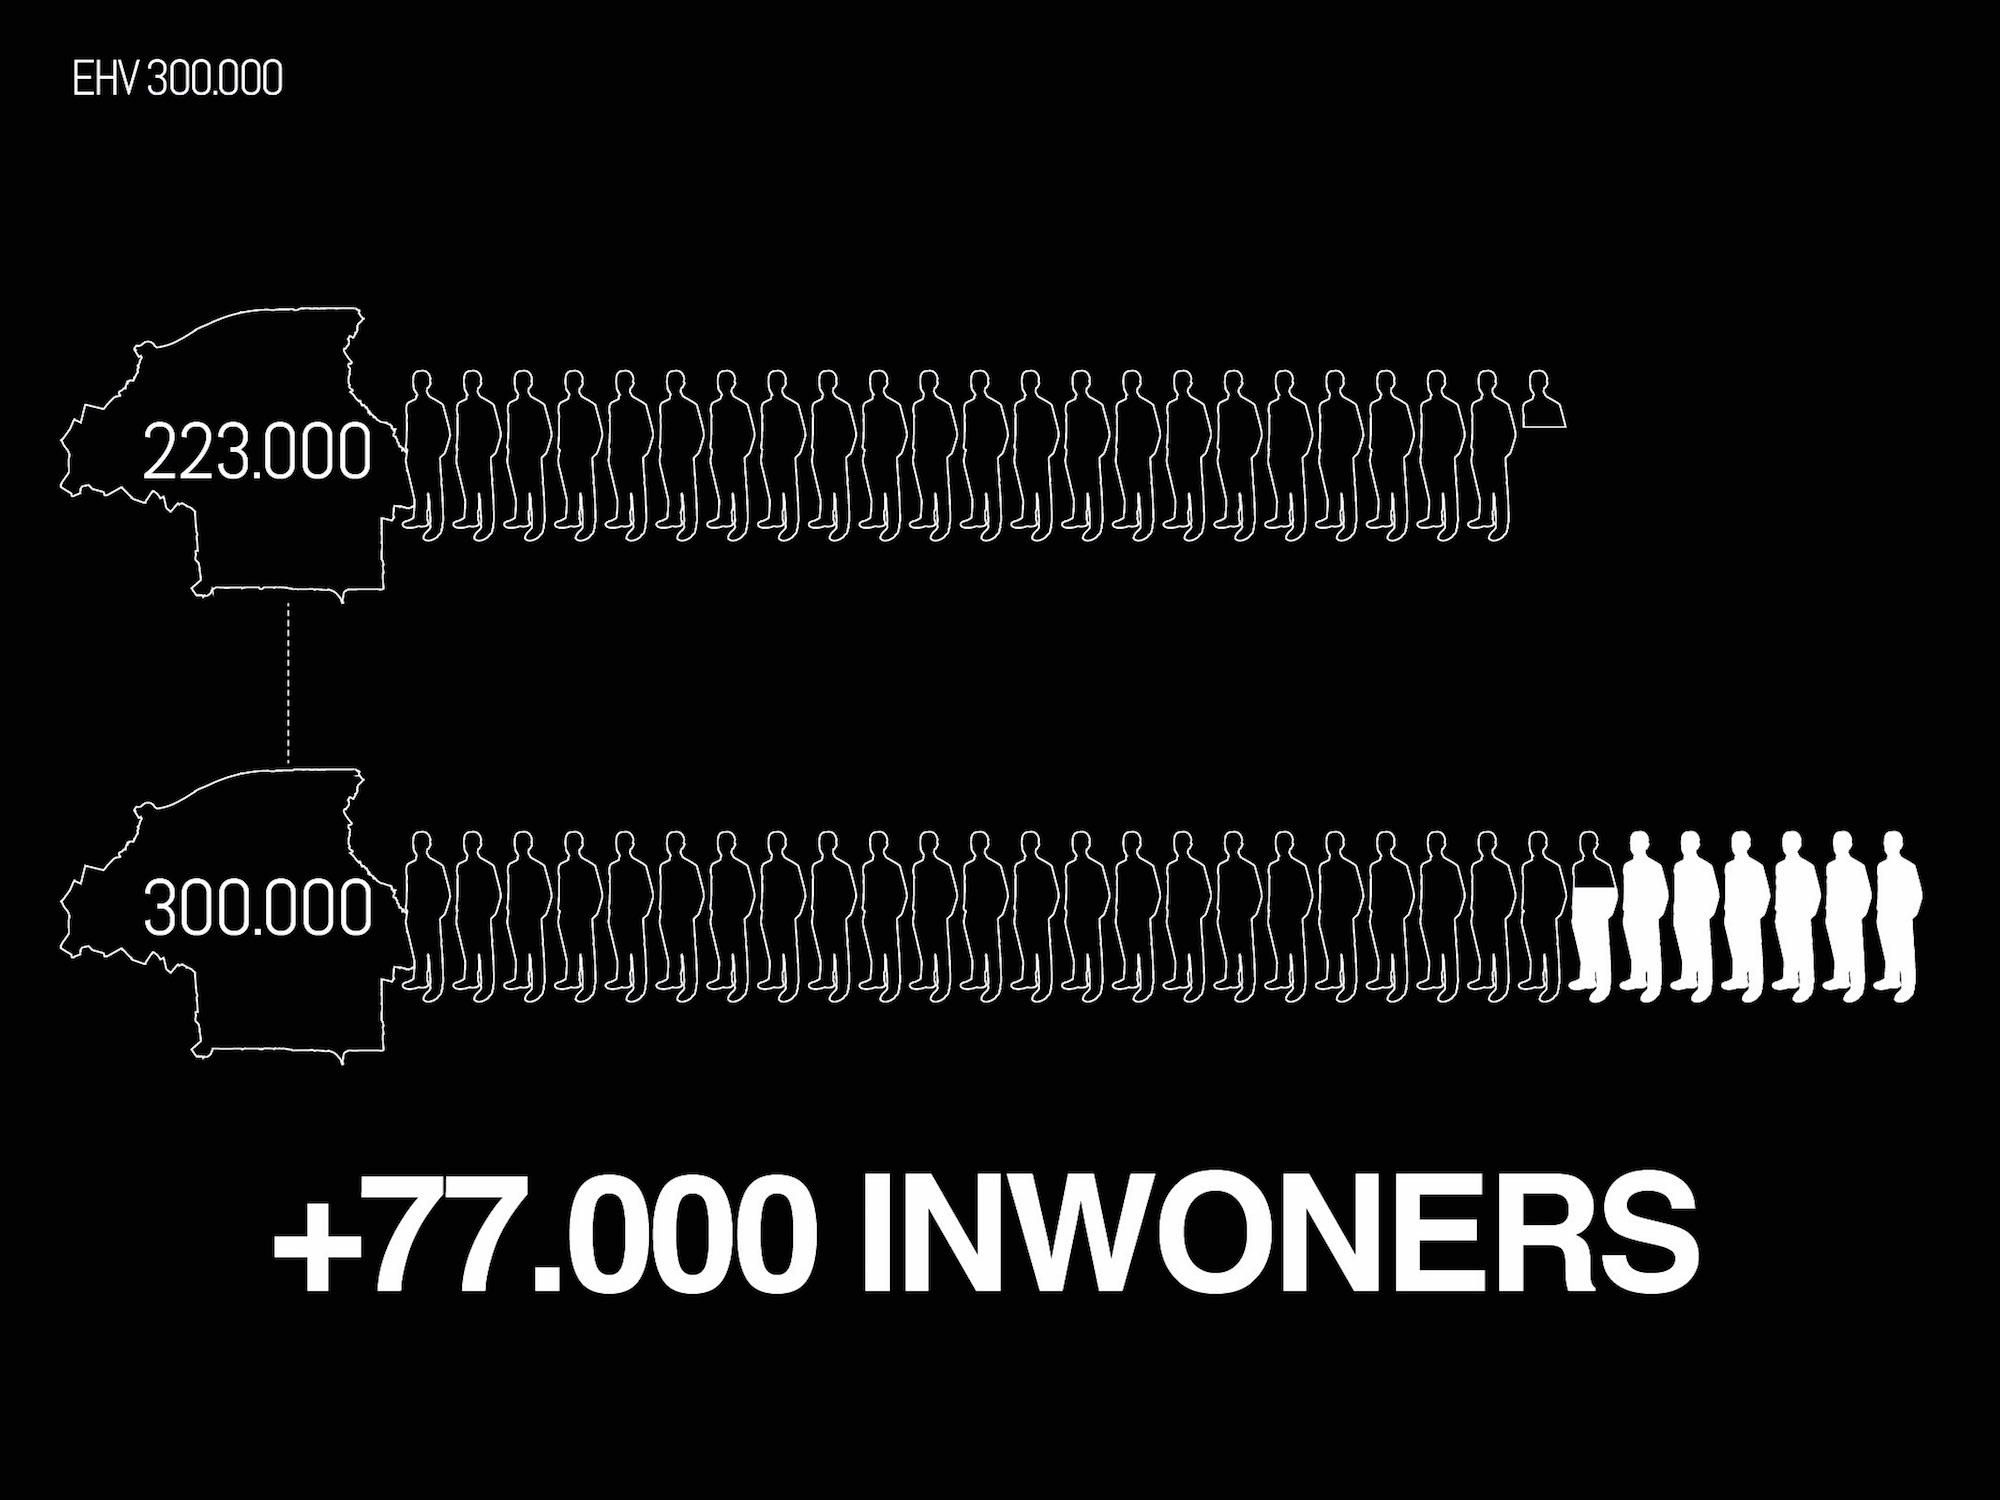 TvT_Research ehv 3000003.jpg